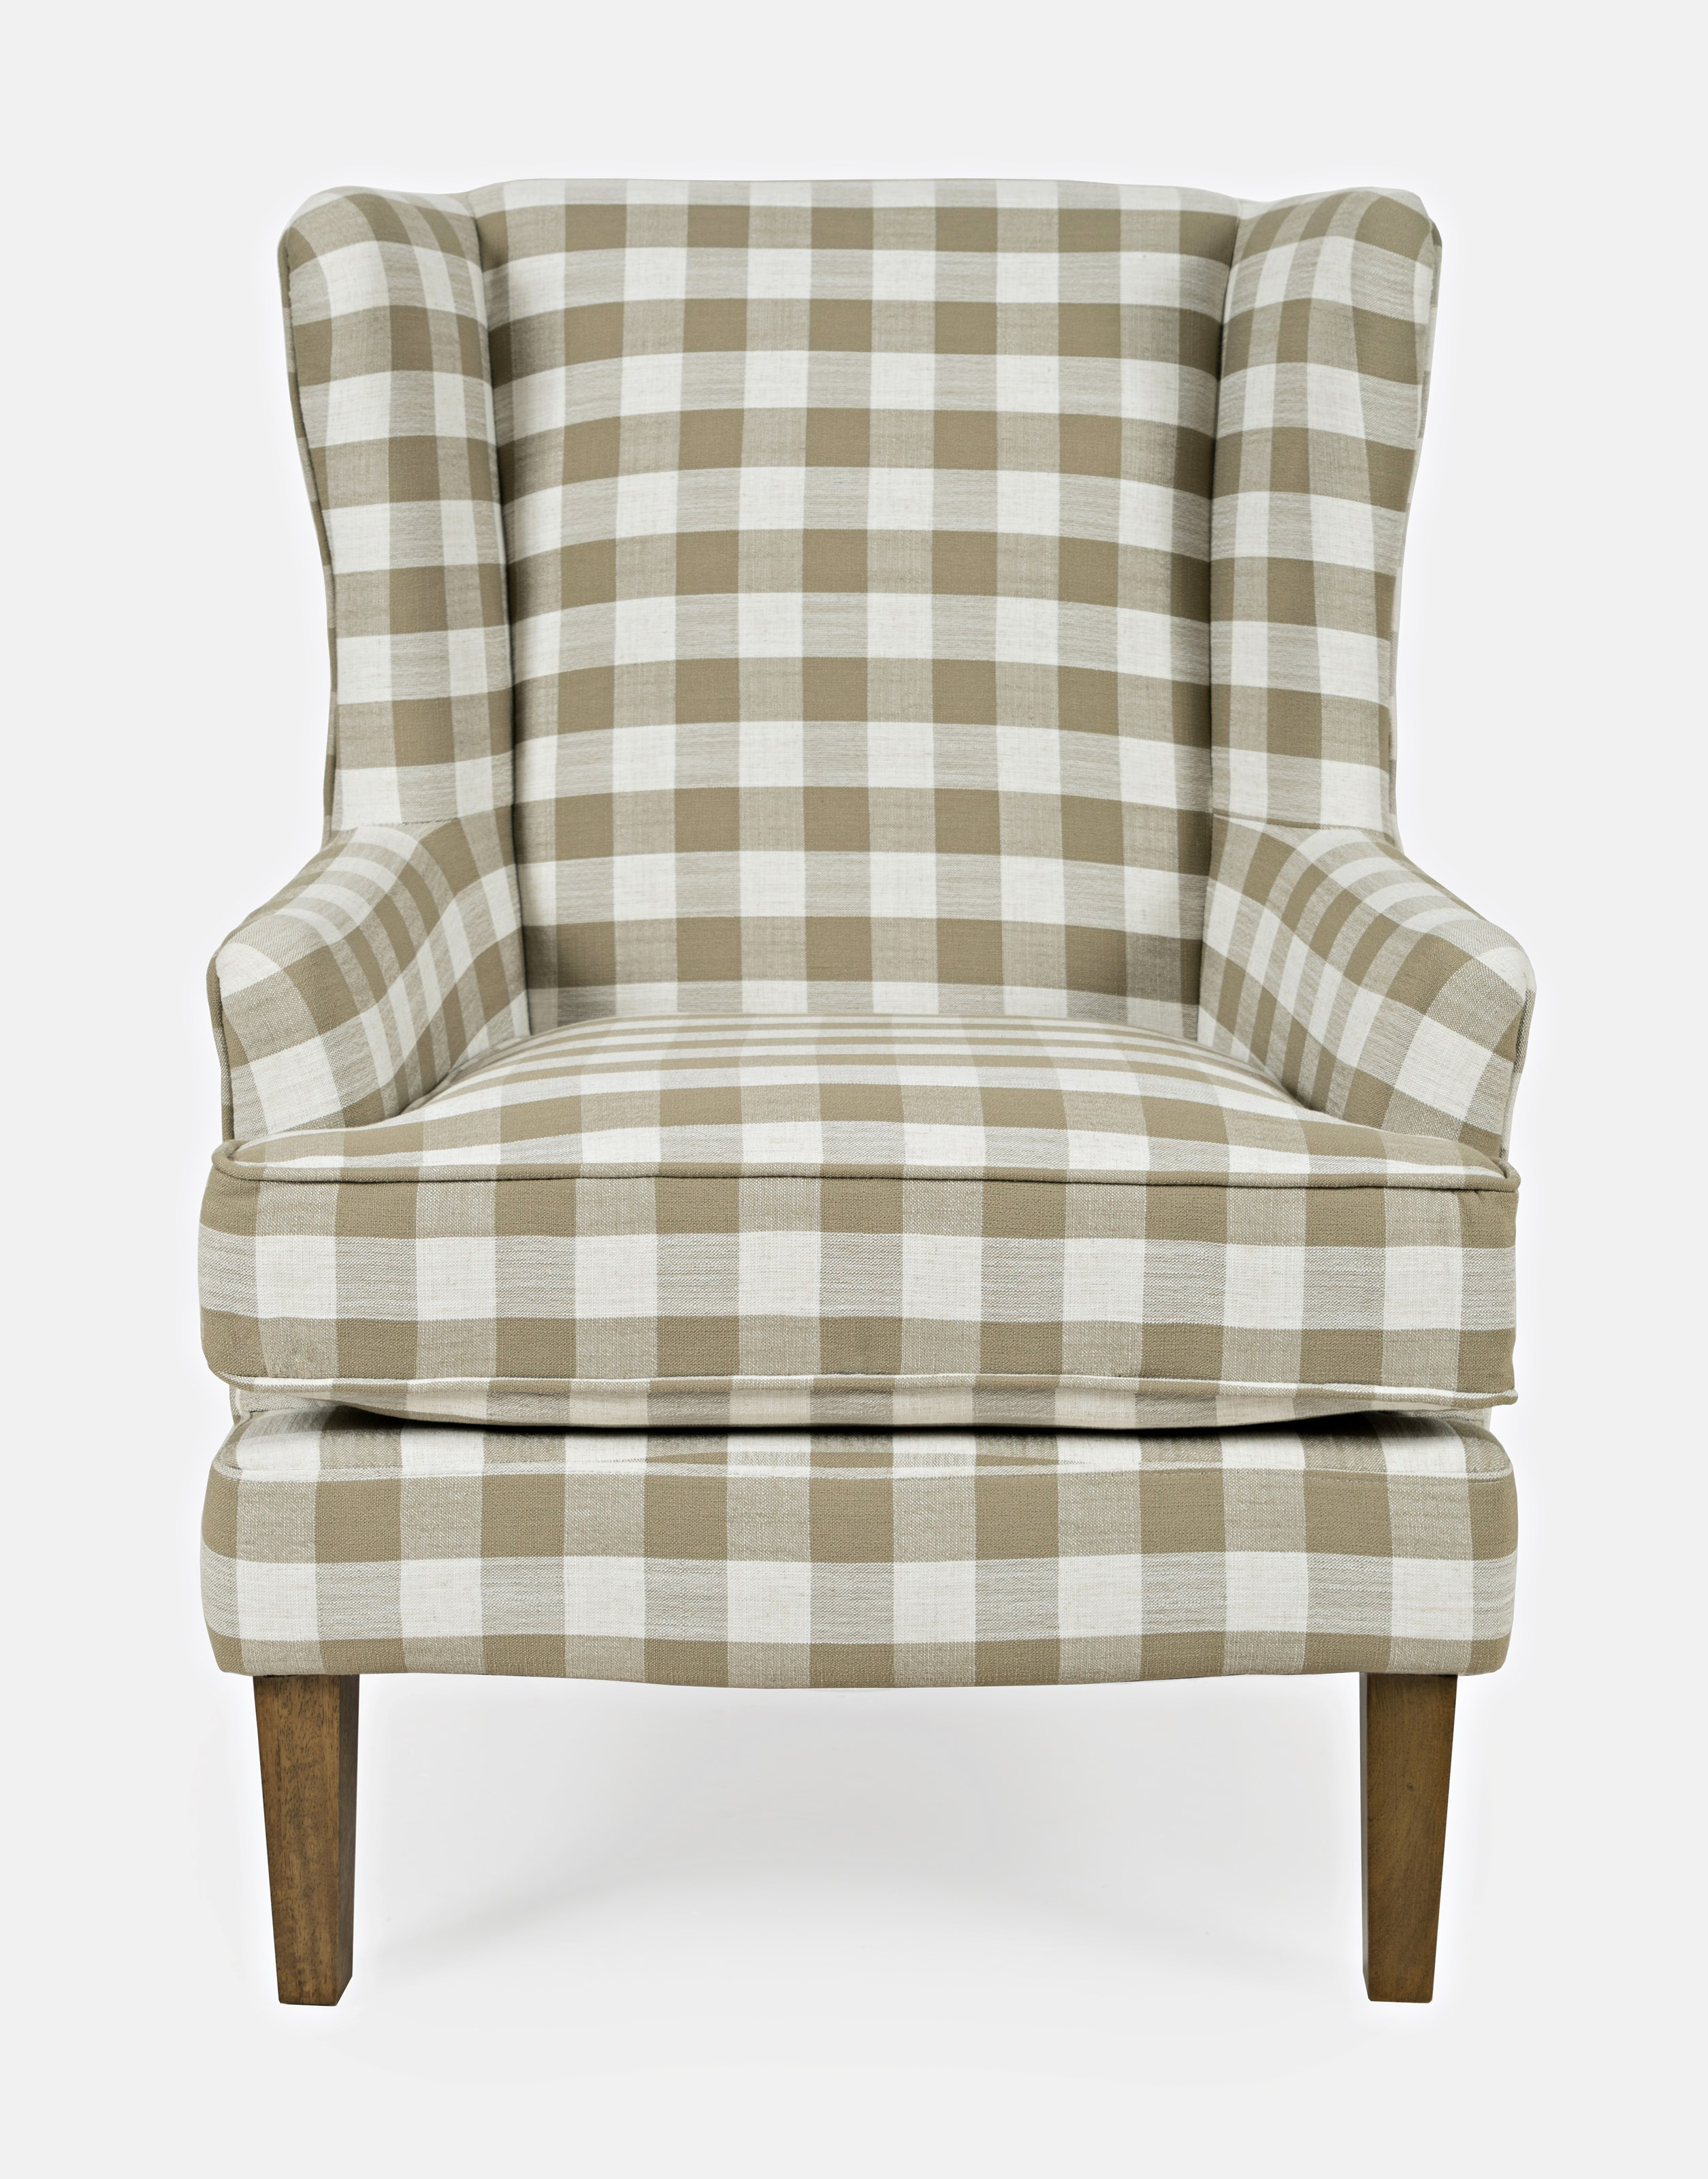 Lancaster Lancaster Chair by Jofran at Jofran